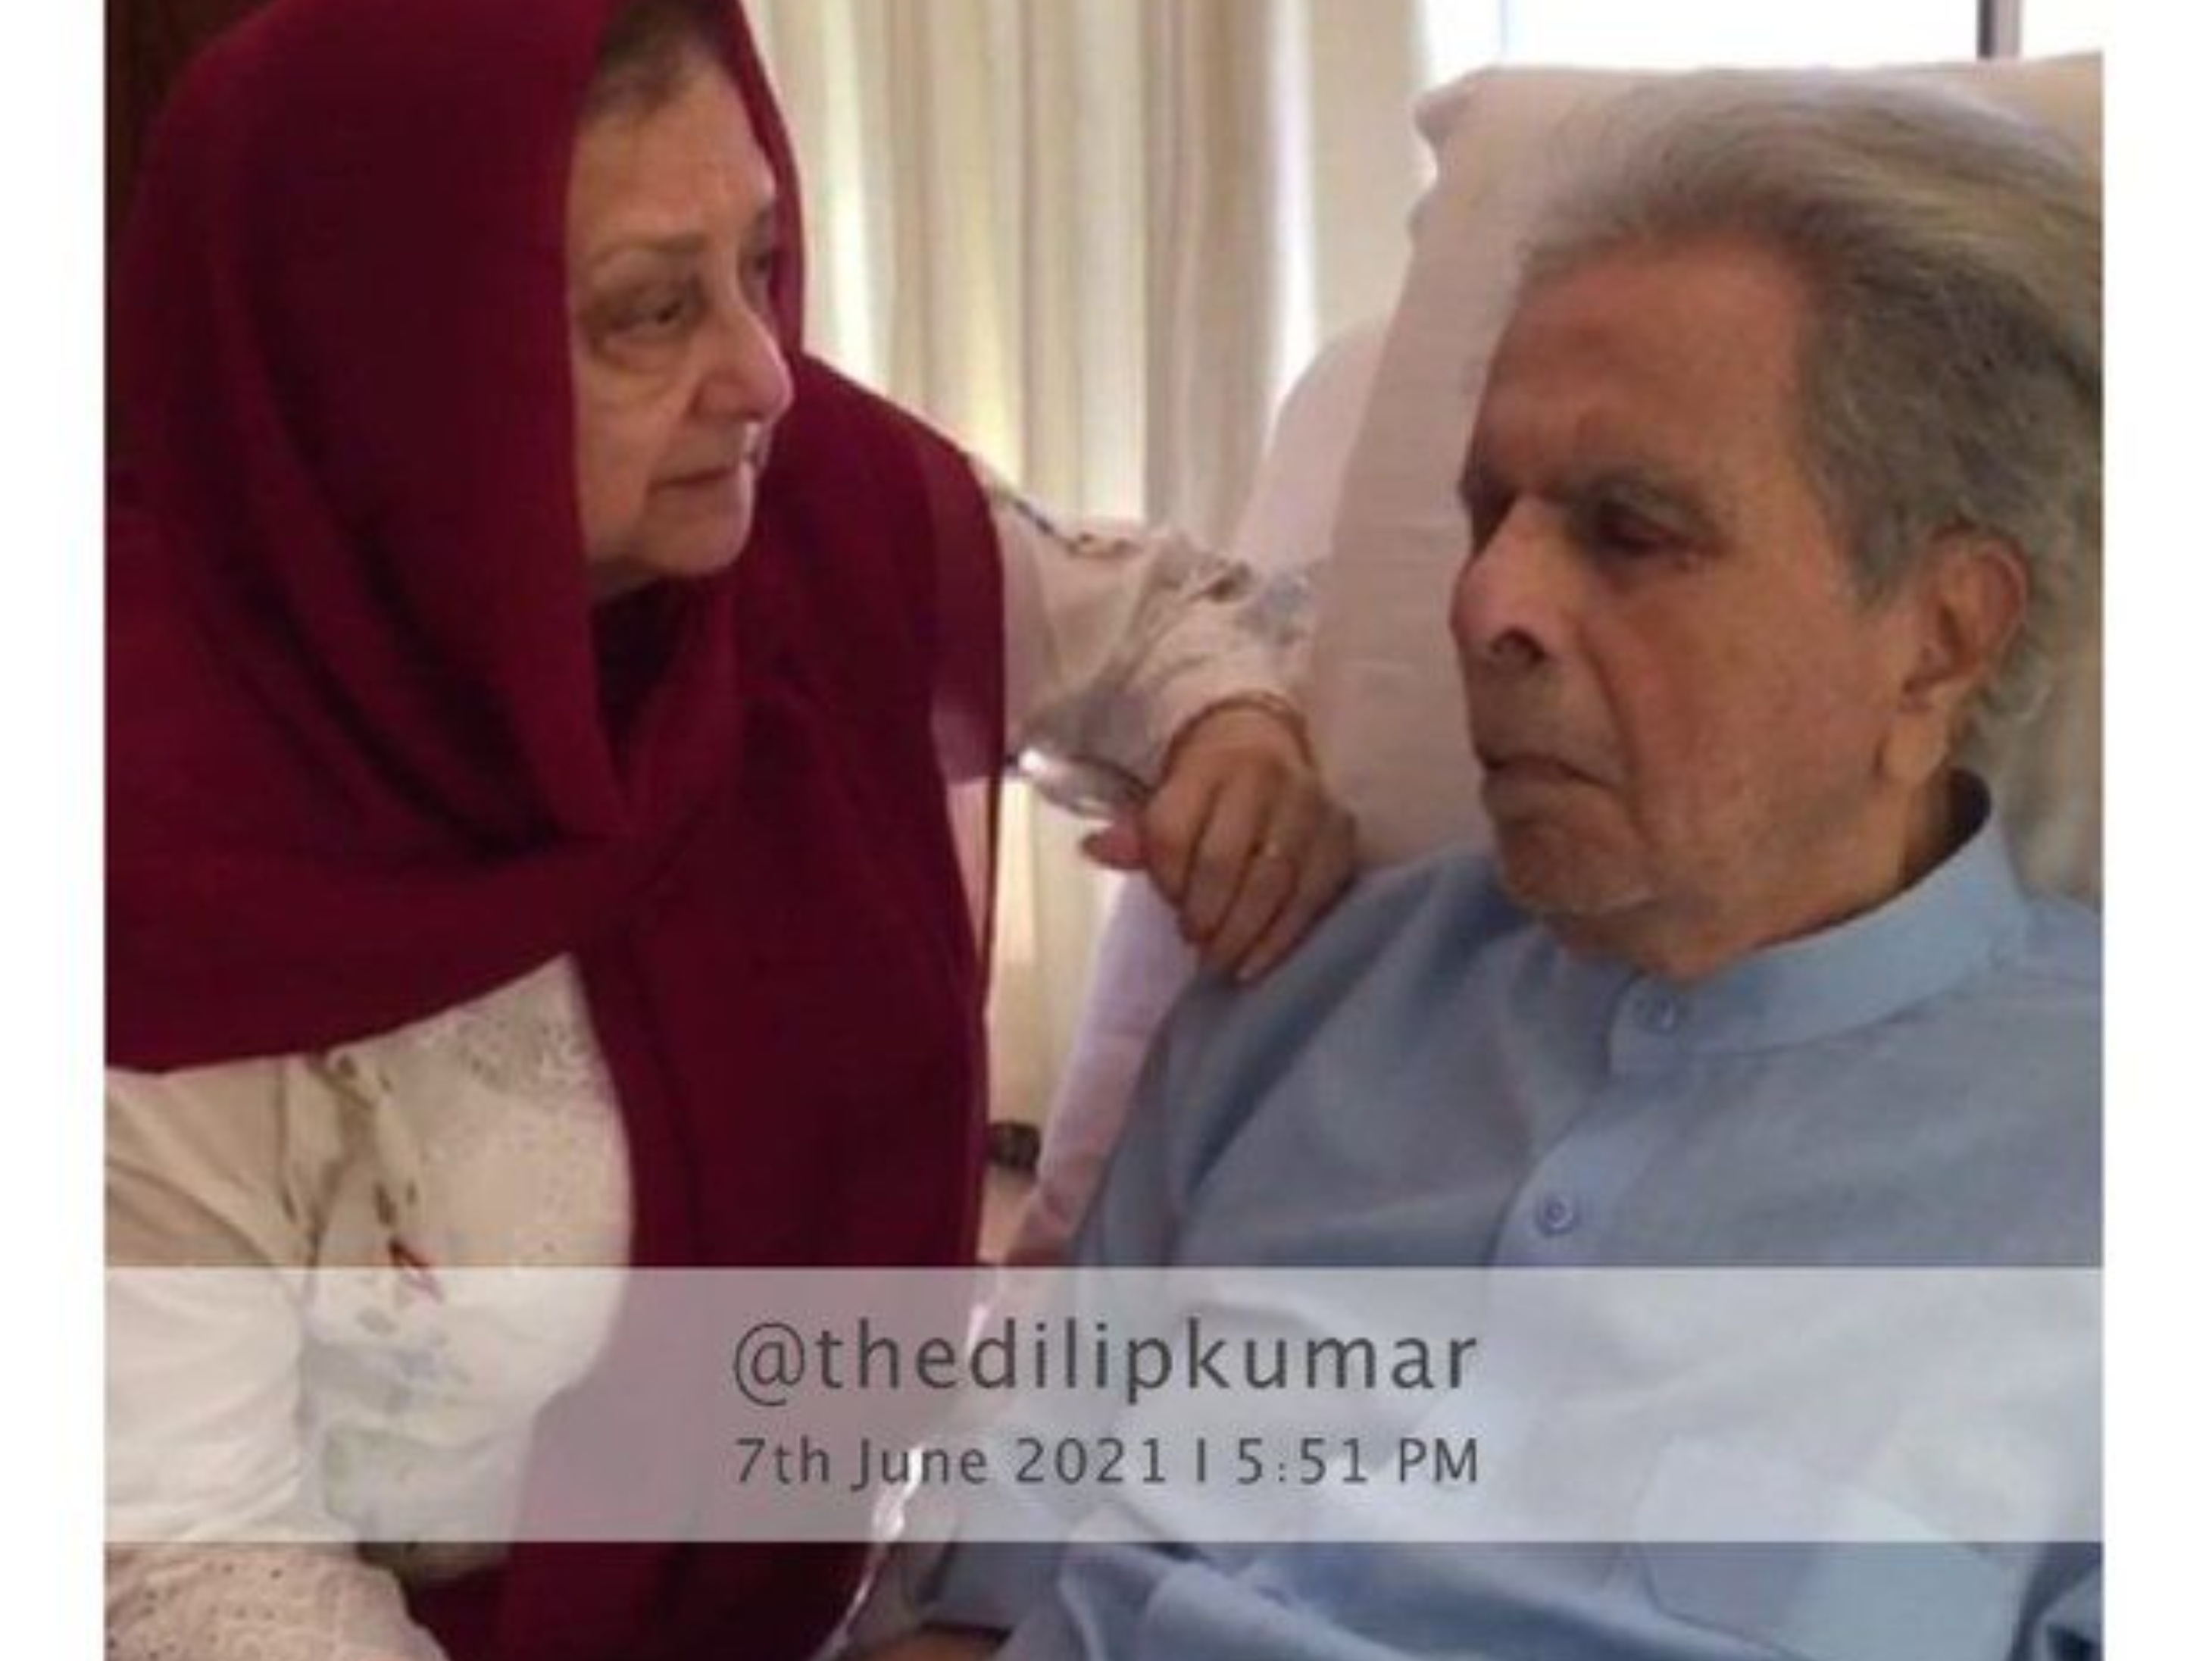 Dilip Kumar's first photo from the hospital; Tragedy King seen without oxygen support | बिना ऑक्सीजन सपोर्ट दिखे ट्रेजेडी किंग, कोरोना के खतरे के बीच सायरा ने भी नहीं पहना था मास्क